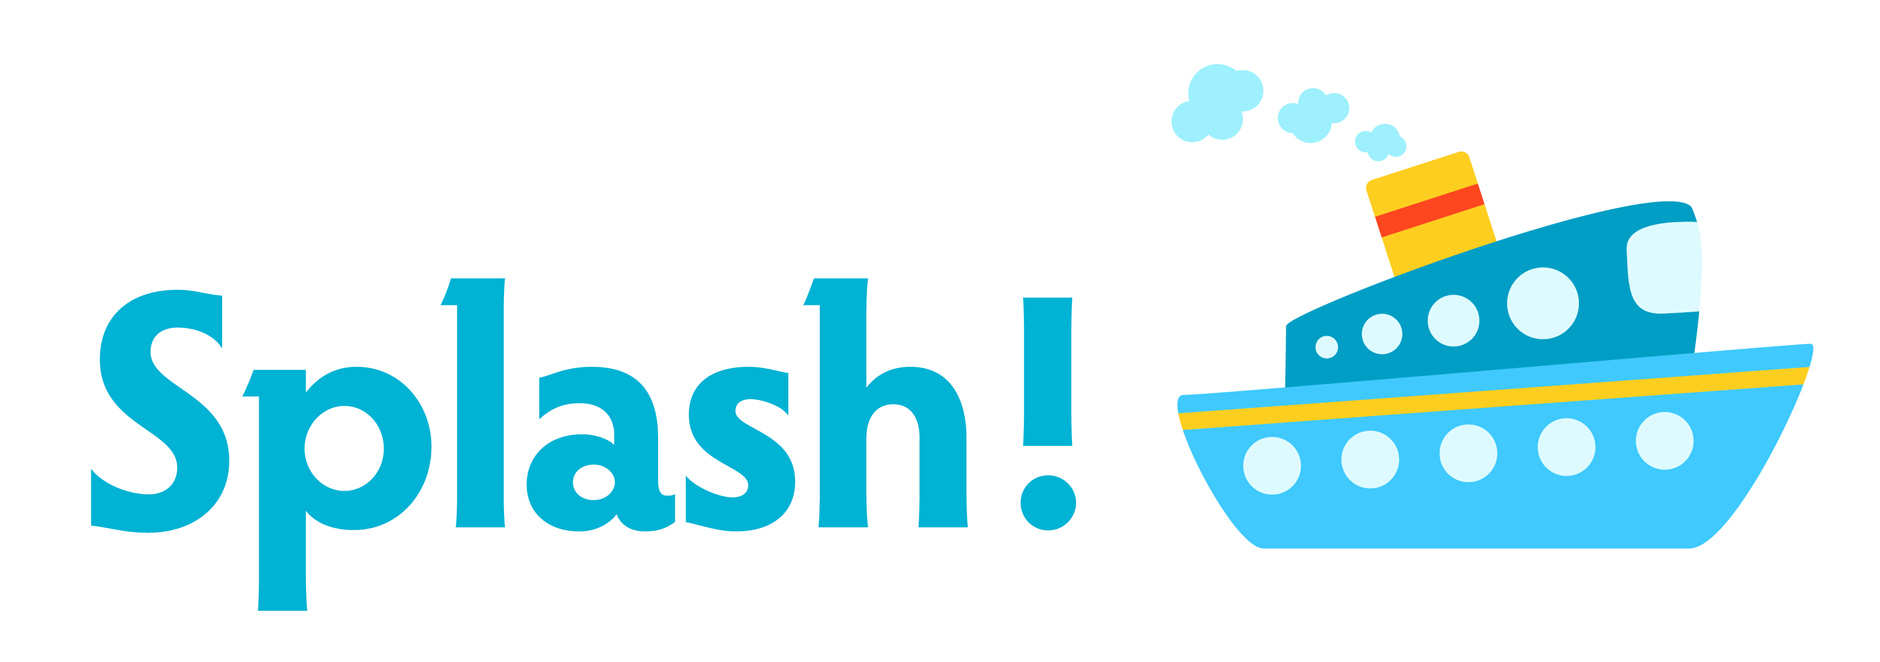 laughlearn_splash_logo_musicforpreschoolers_kindermusik.jpg